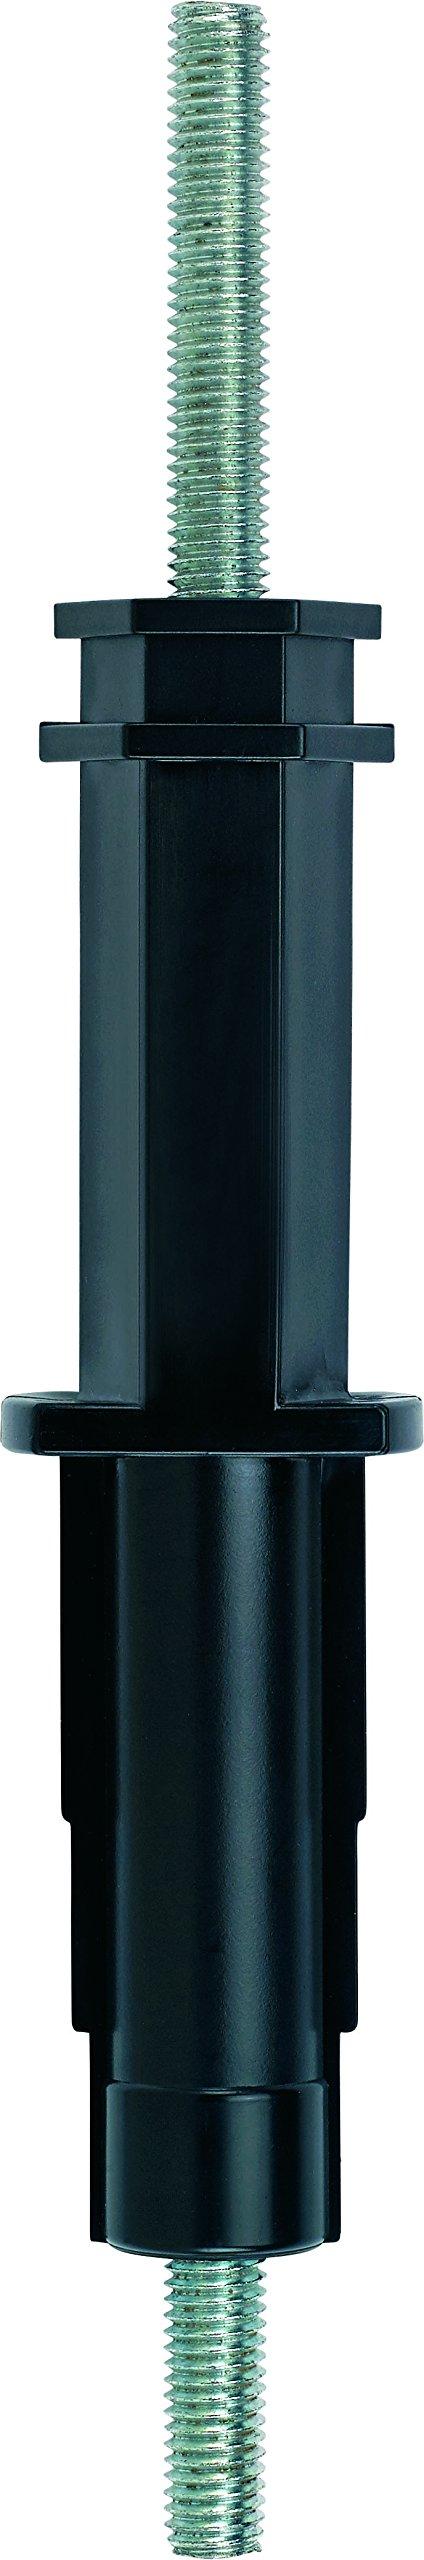 Underhill A-EO-SRT12K EasyOut Sprinkler Removal Tool, Fits 2''- 6'' Pop-up Spray Head Sprinklers